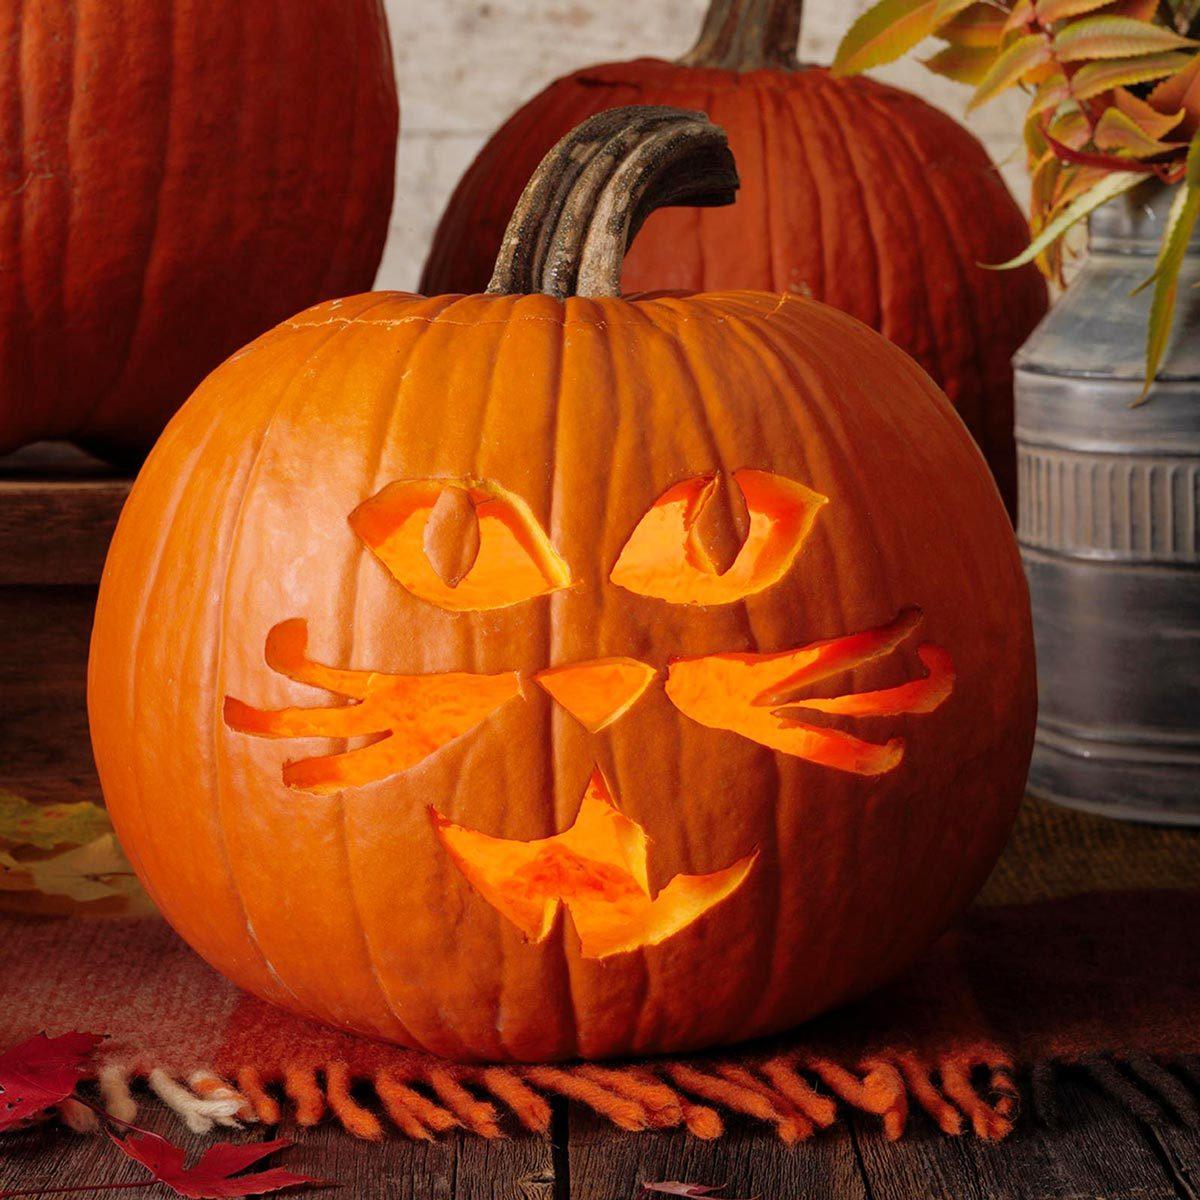 classic cat jack o'lantern pumpkin halloween